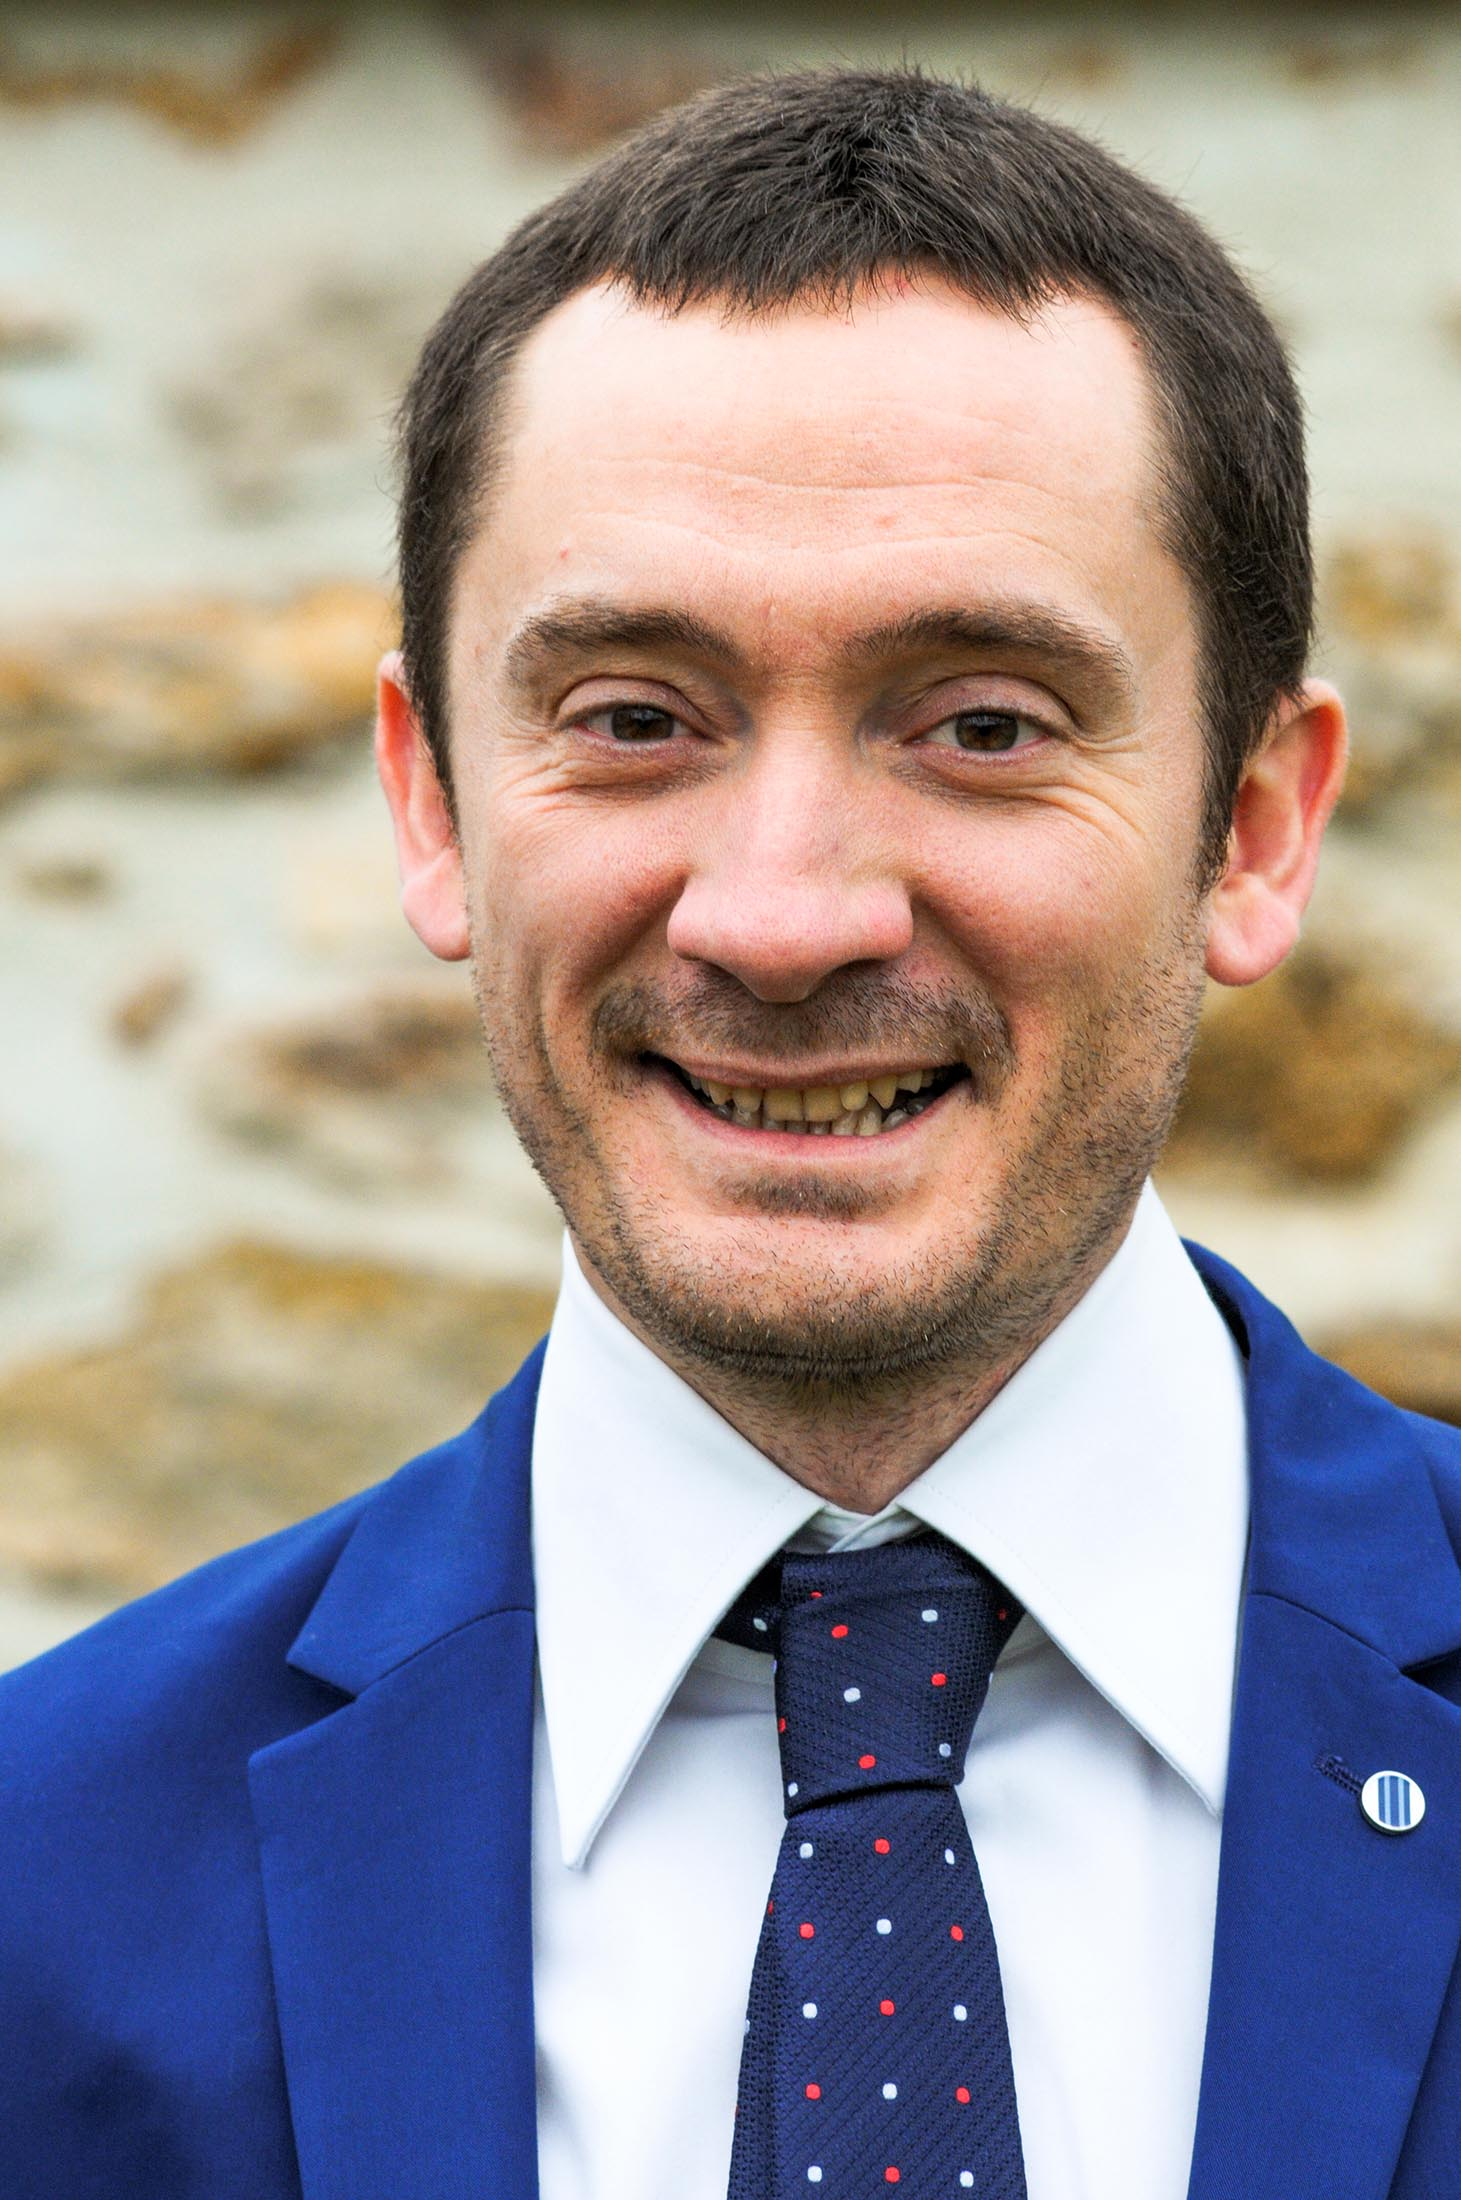 <b>Jérôme CAUET</b> - auton5